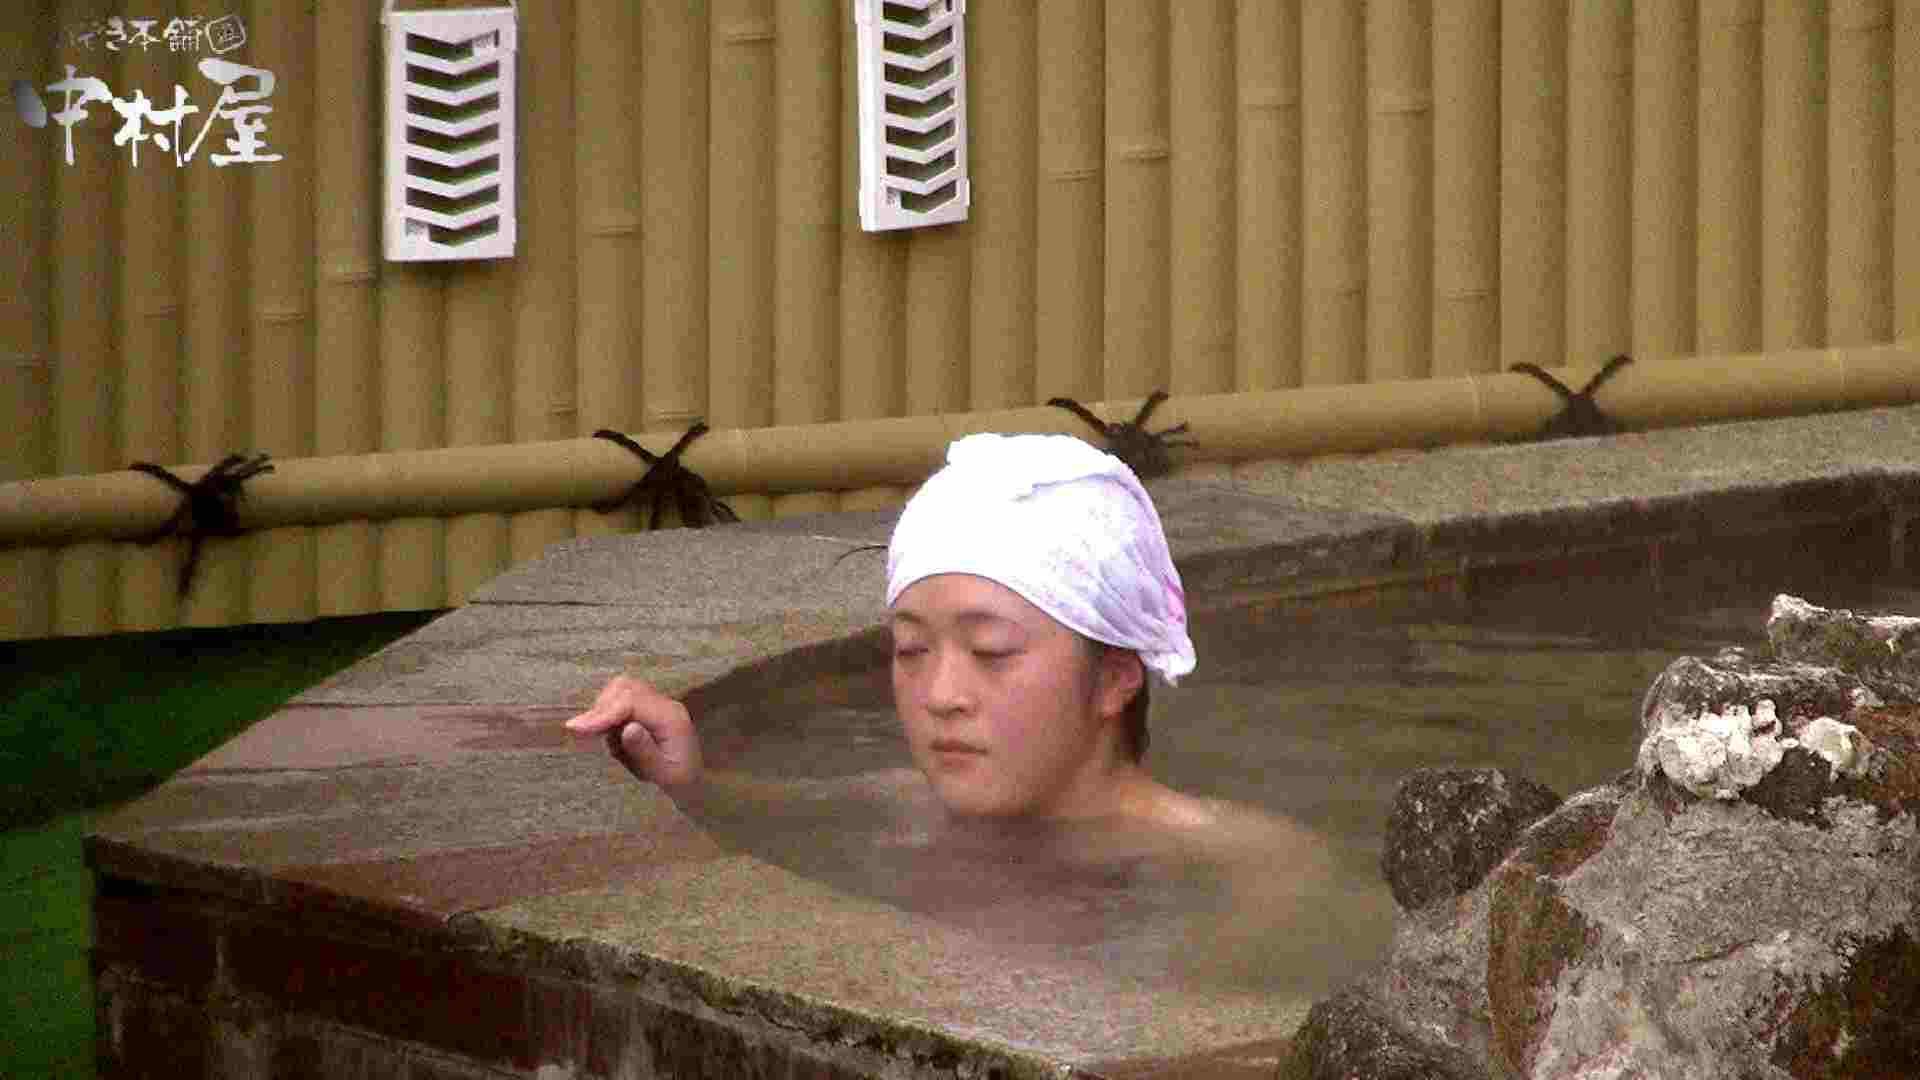 Aquaな露天風呂Vol.920 露天風呂突入 濡れ場動画紹介 69pic 5